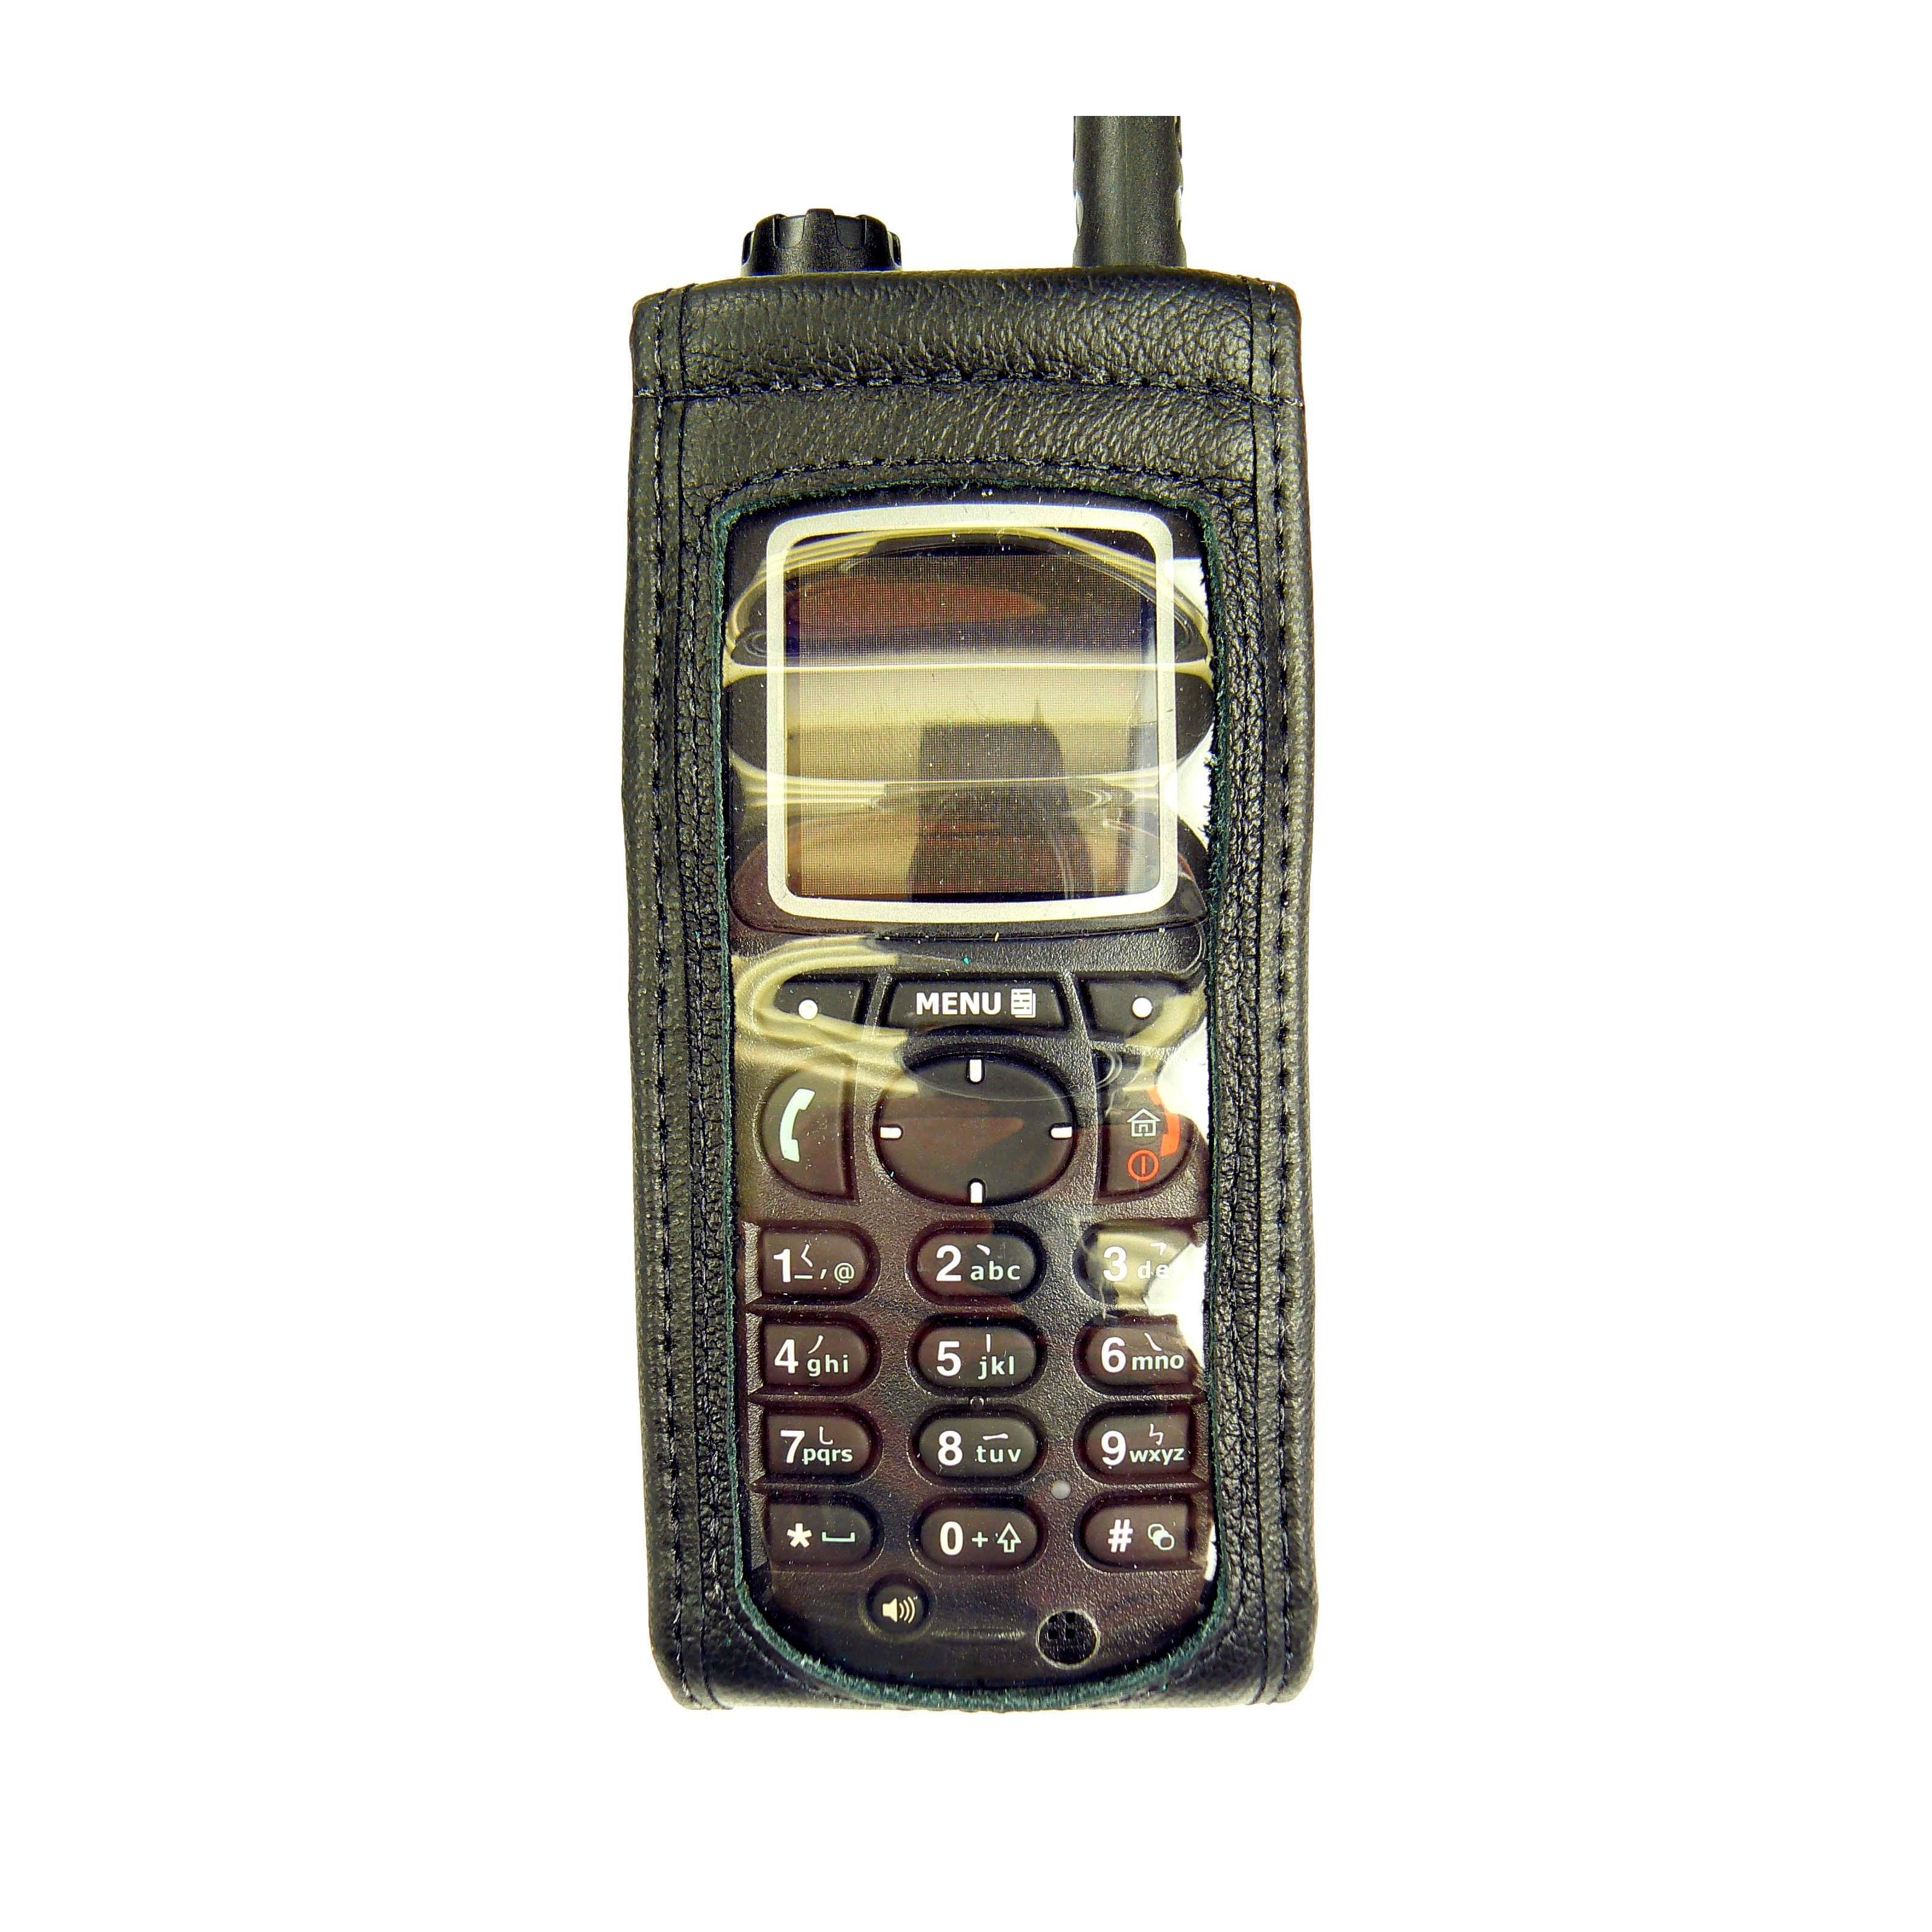 Motorola MTP850 leather radio case with Click-On